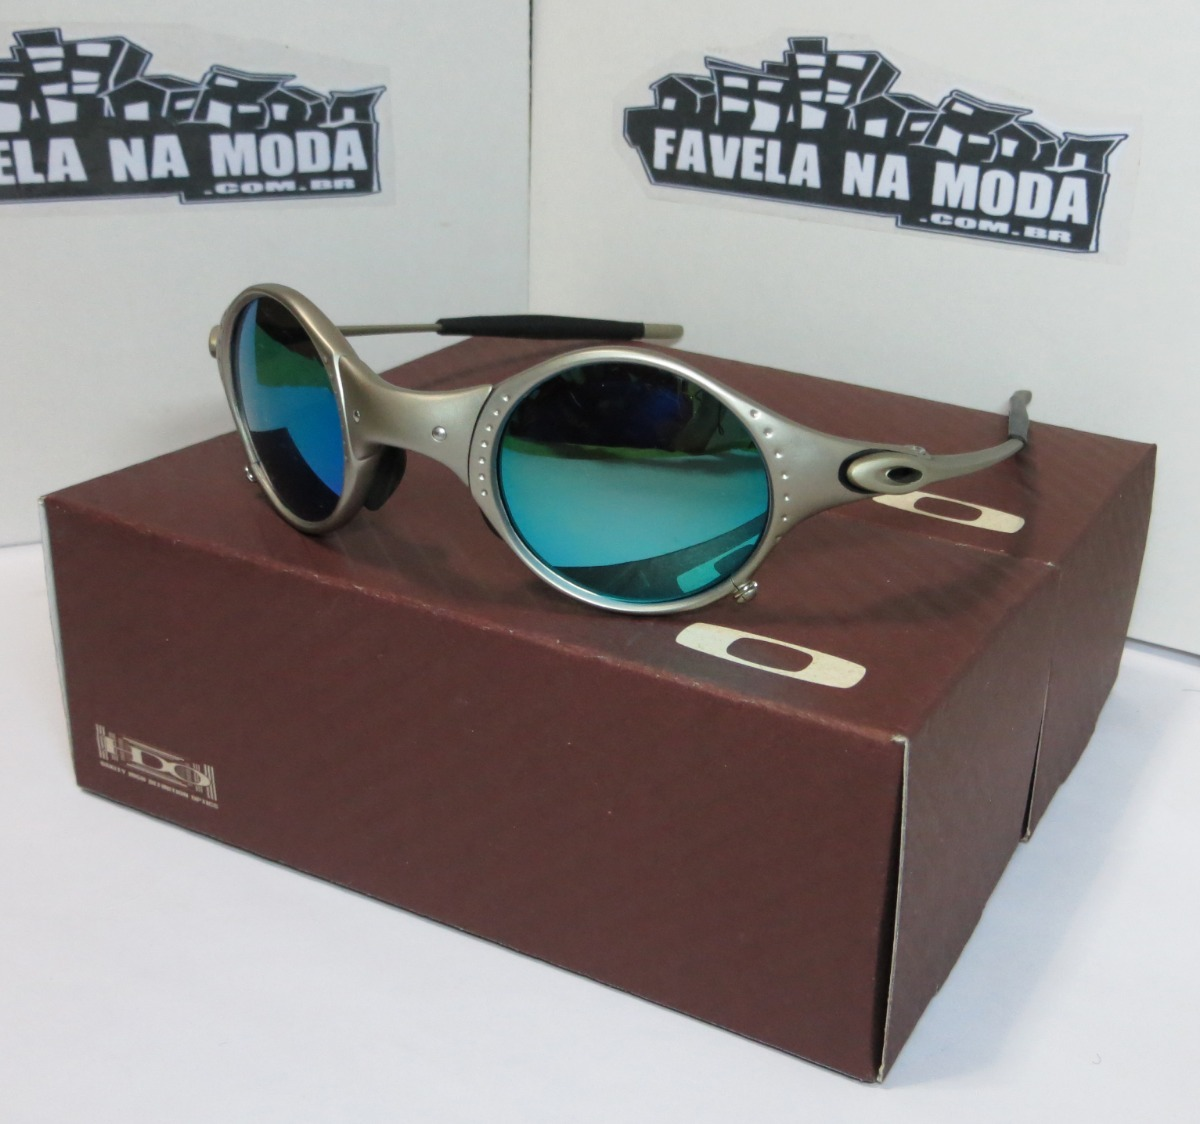 edcb3f1d63cb5 Óculos Oakley Mars   Plasma   Ice Thug   + Par De Lentes - R  179,00 ...